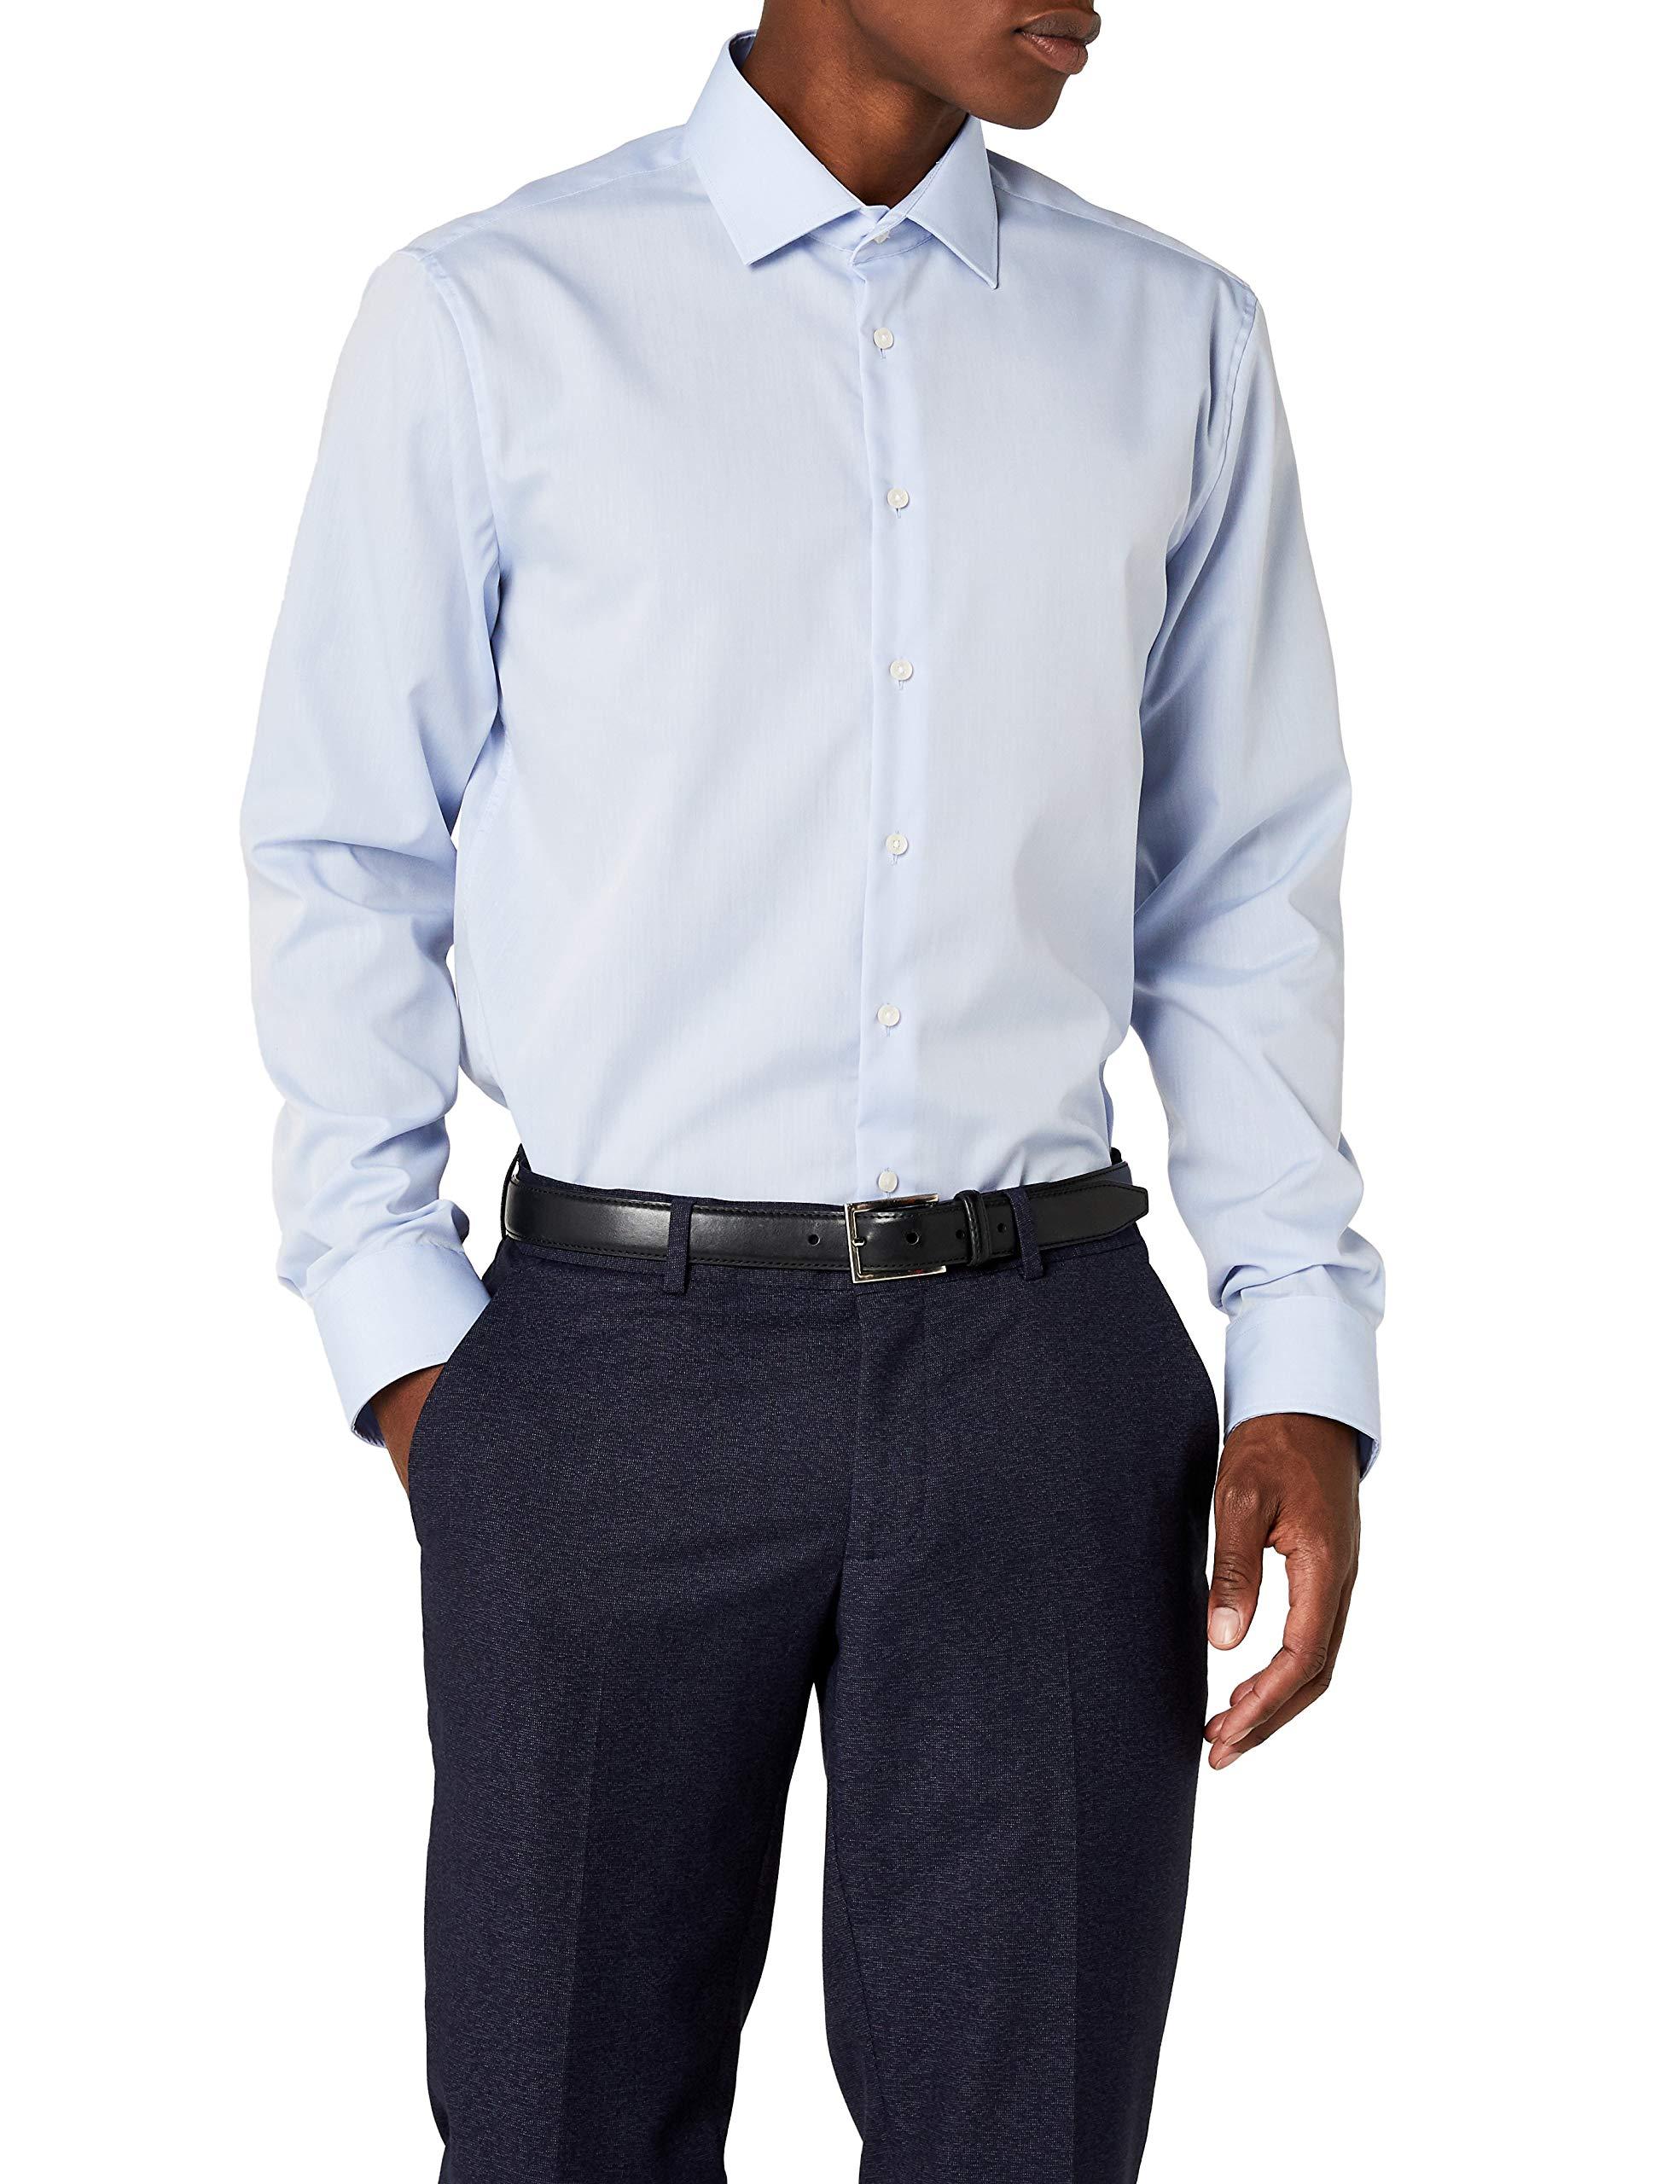 b27594dc218e Seidensticker Herren Business Hemd Tailored Langarm Kent-Kragen Bügelfrei  product image